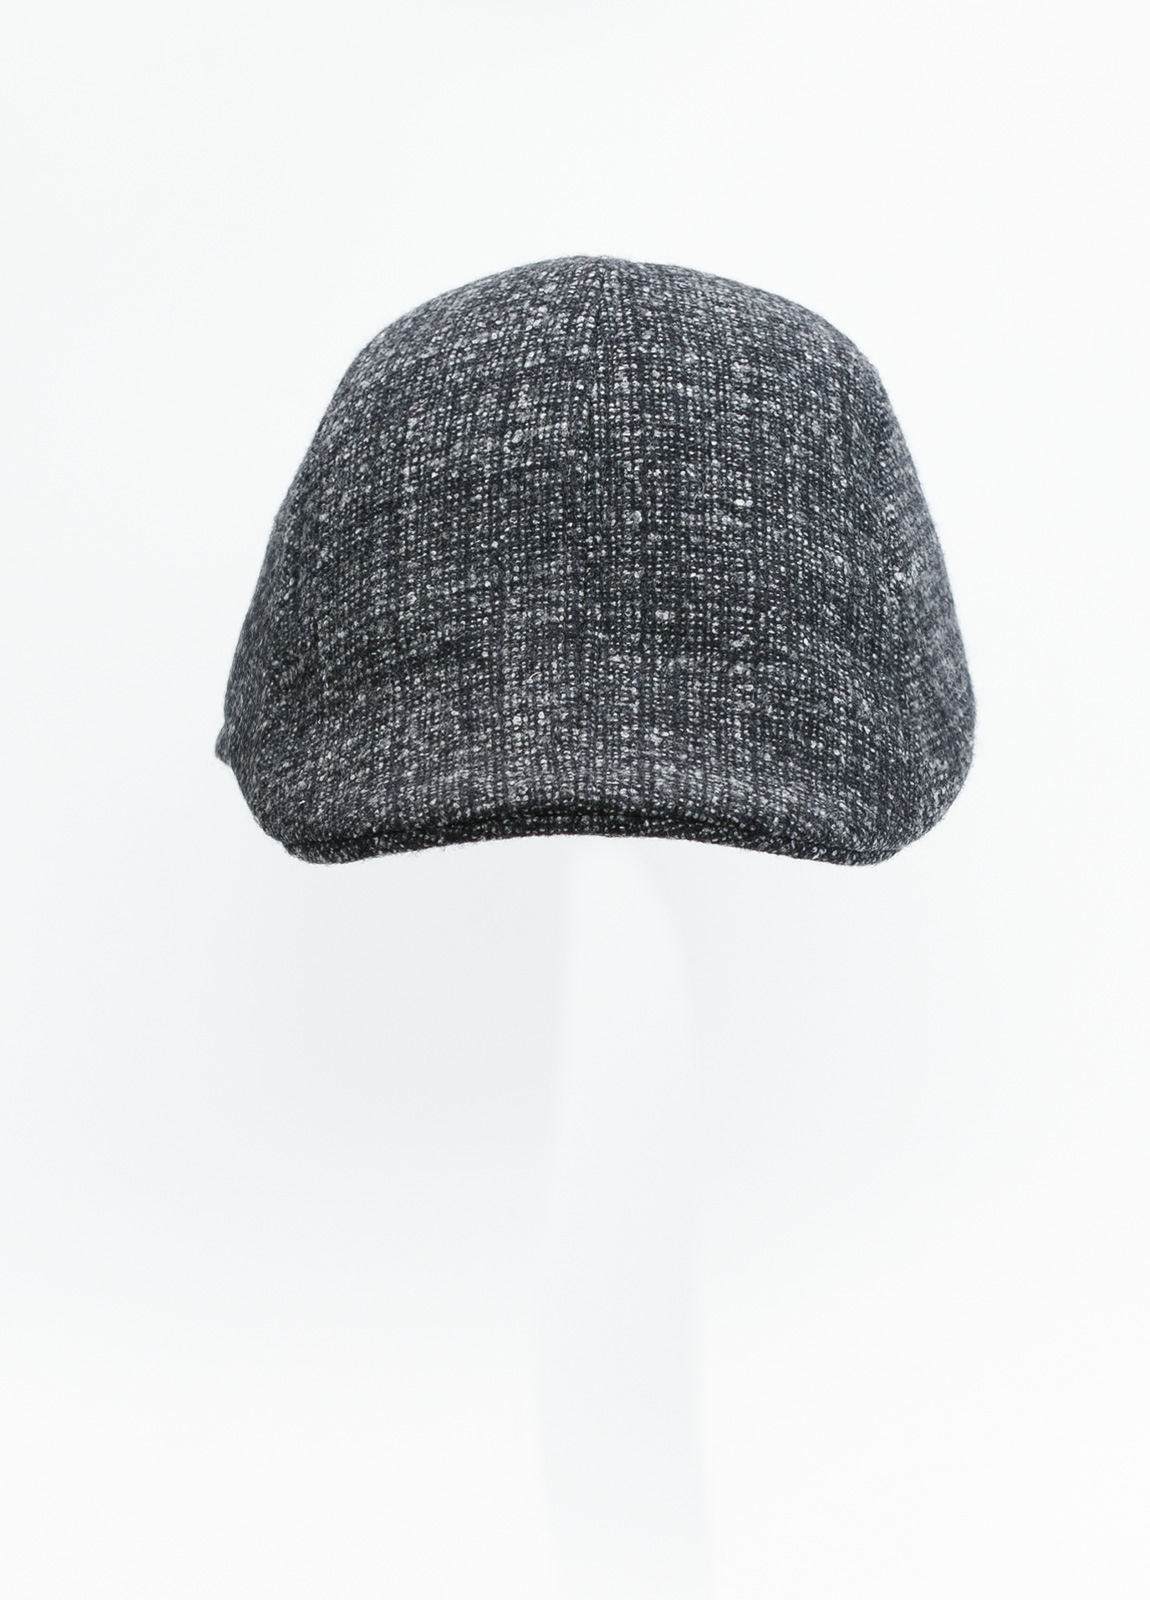 Gorra tipo ascot color gris tejido de lana con diseño jaspeado. - Ítem1